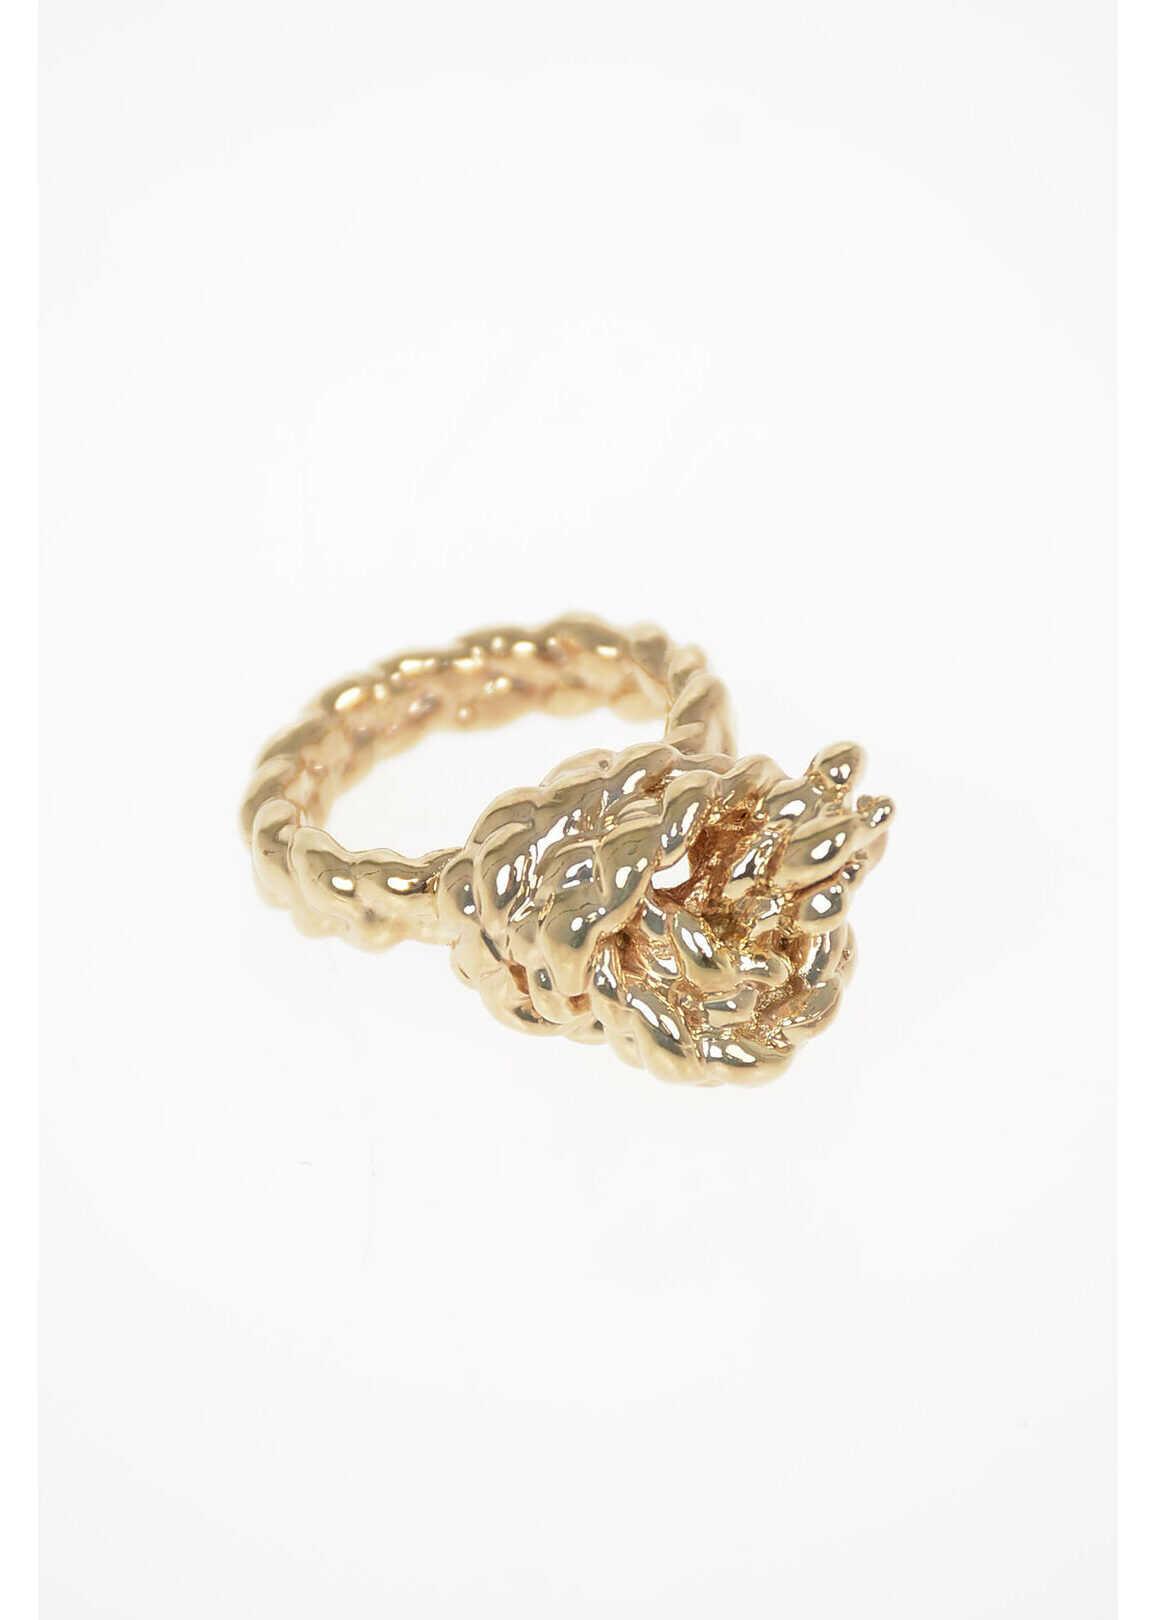 Maison Margiela MM11 Brass Ring GOLD